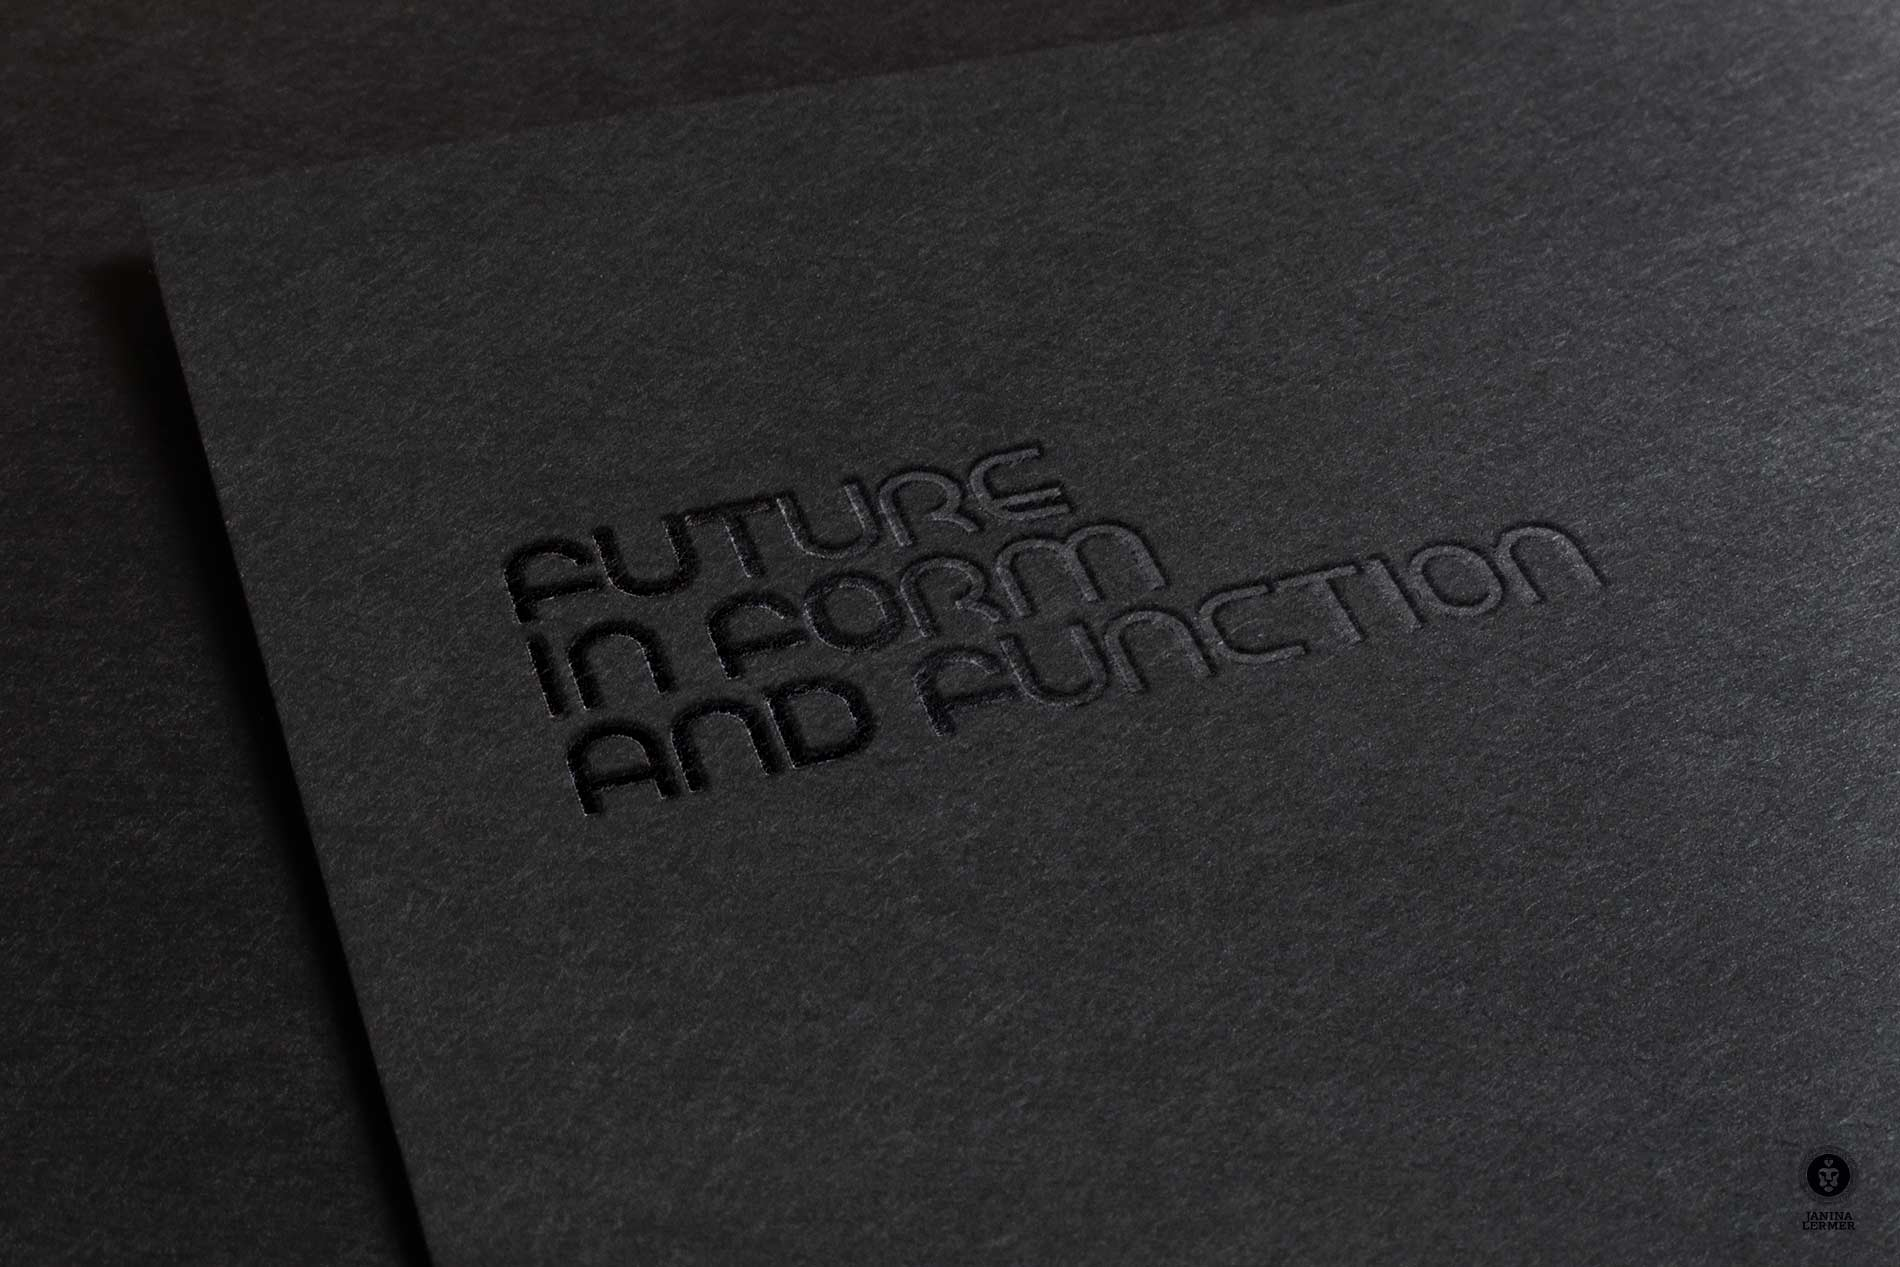 Janina-Lermer-Markenentwickung-Markengestaltung-Branddevelopment-Branddesign-Del-Rosario-Schrift-Font-Silk-Stamping-Praegung